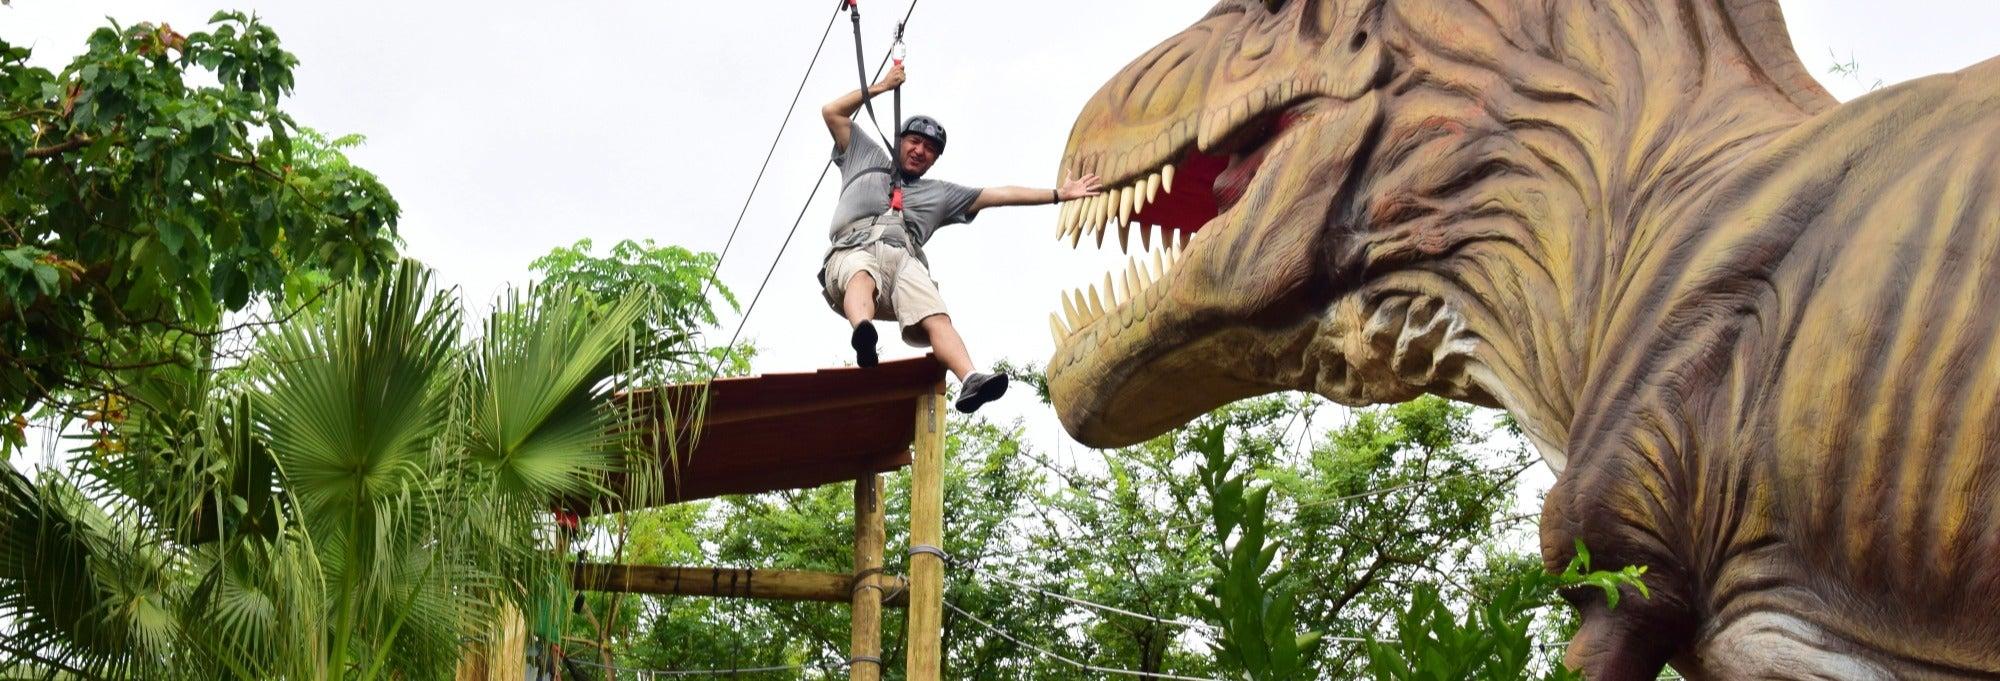 Ingresso do parque Dino Adventure